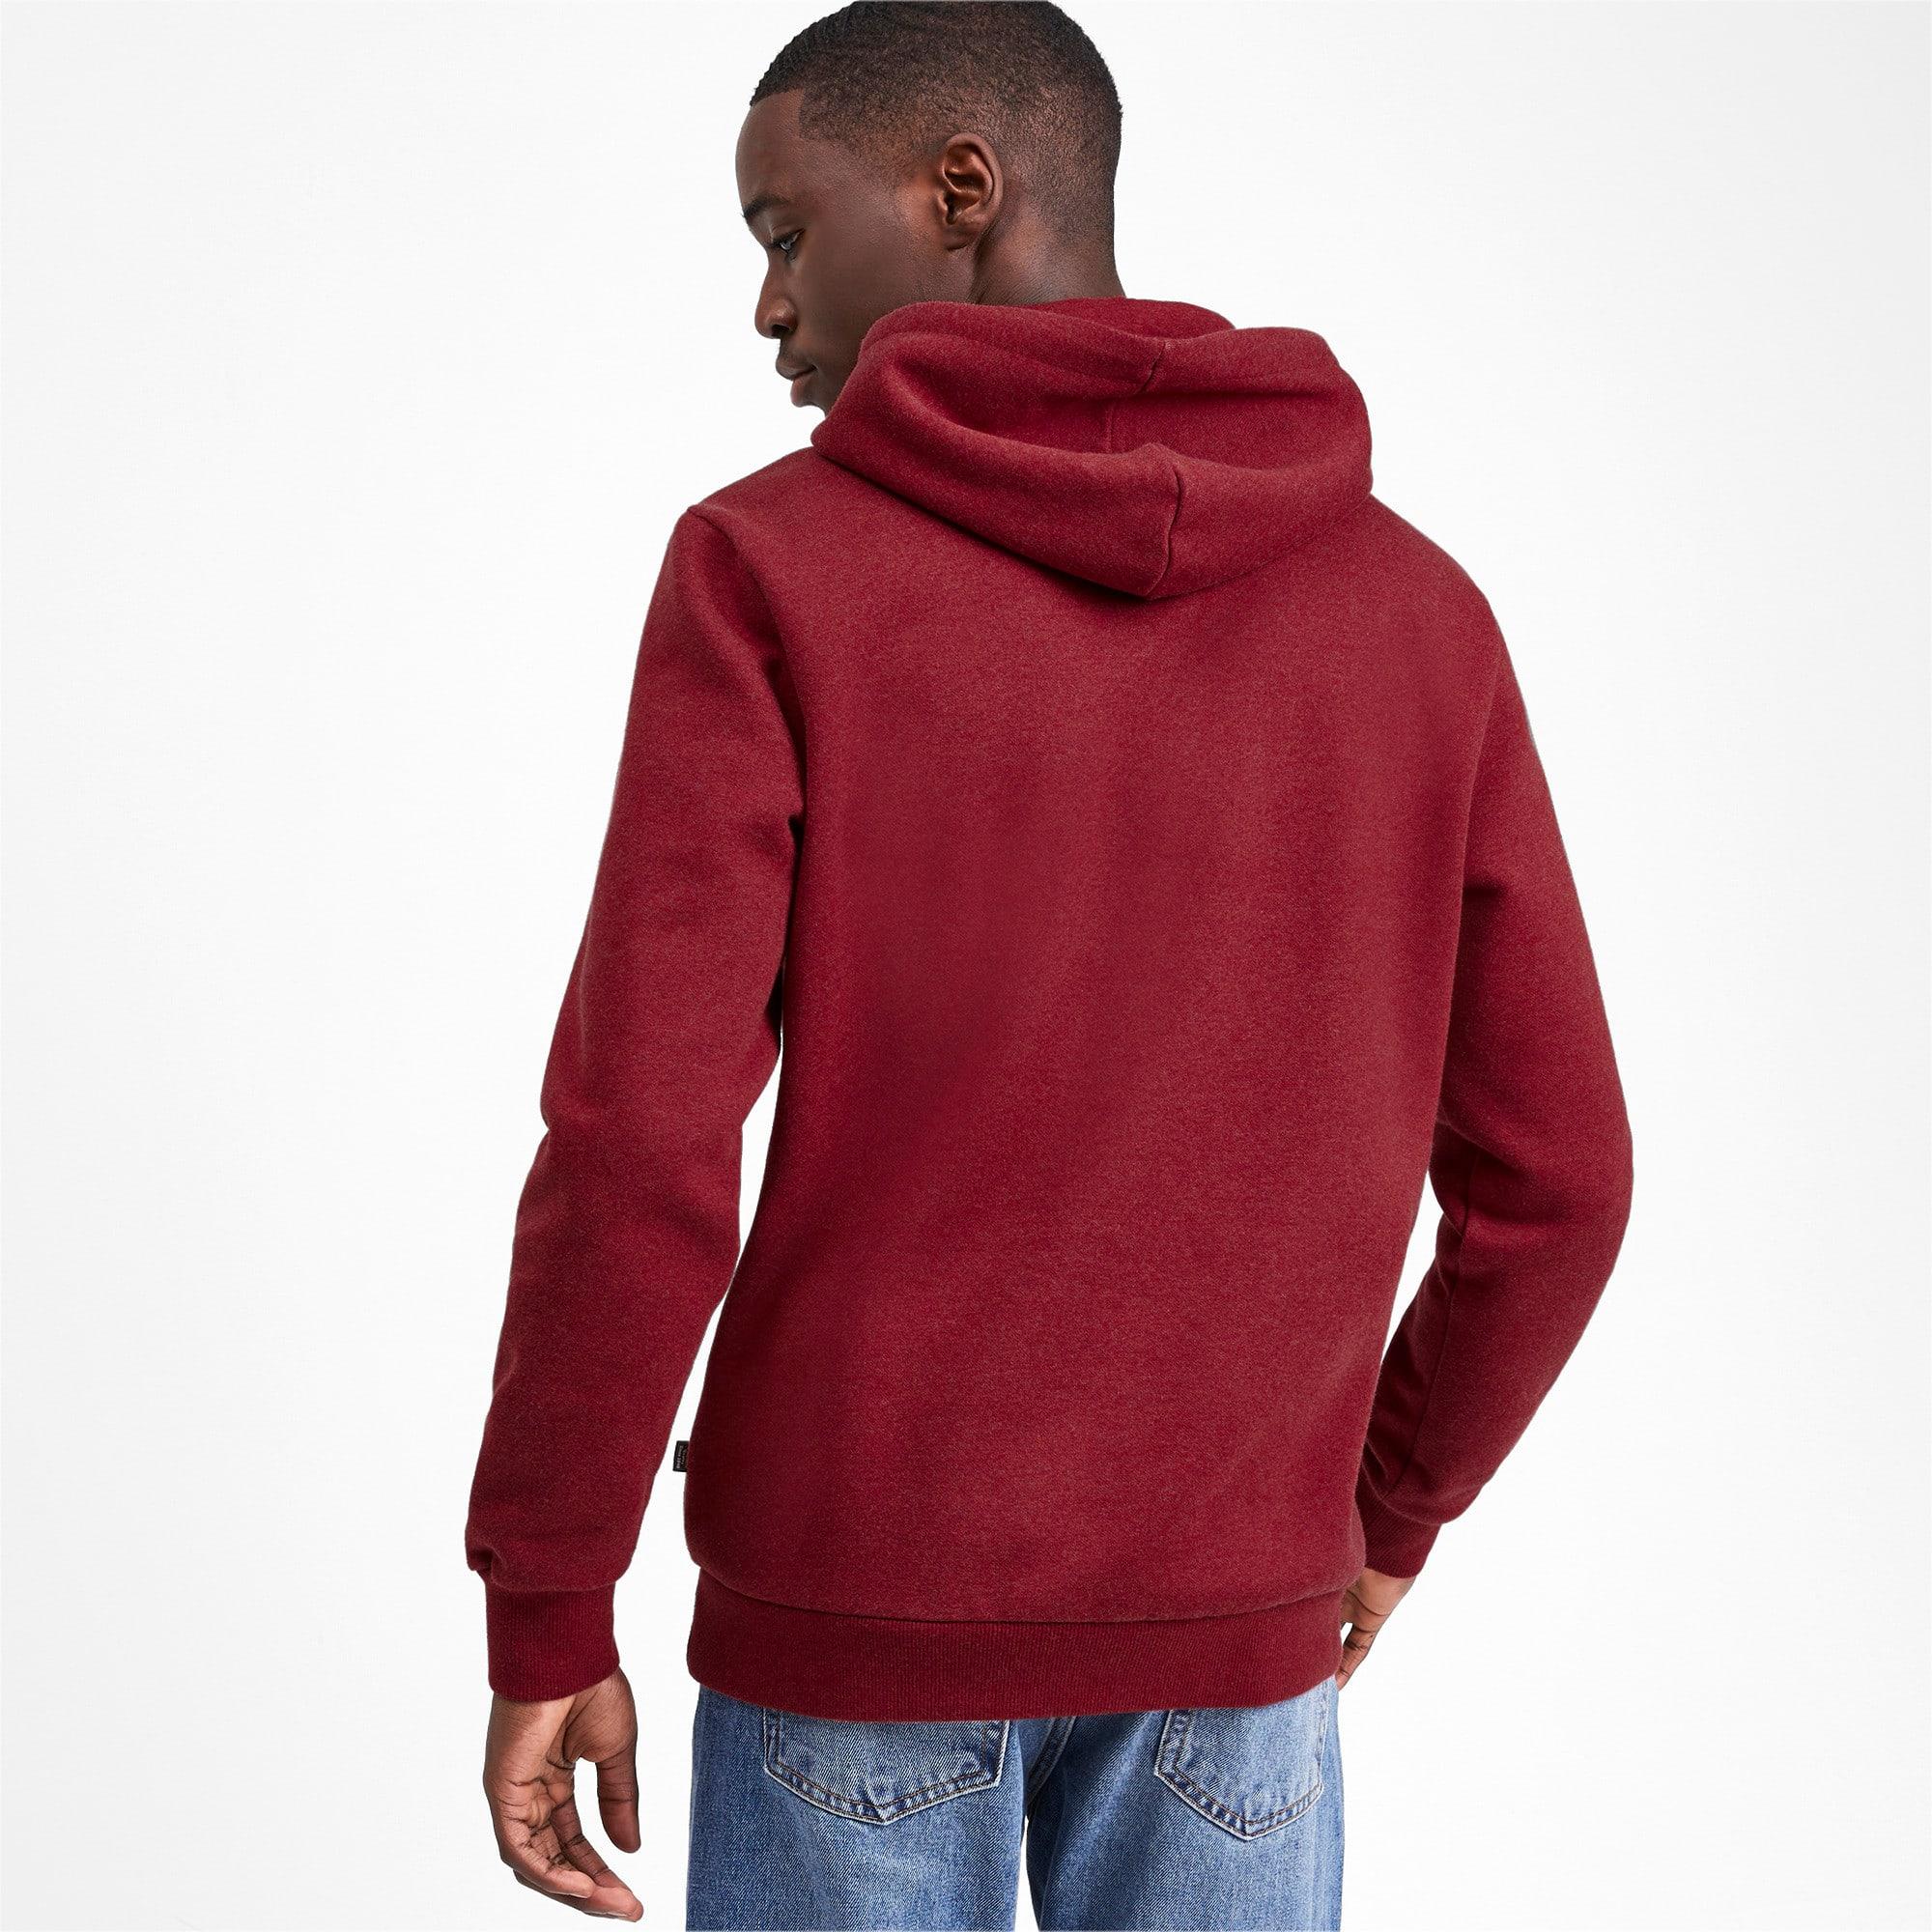 Thumbnail 3 of Essentials+ Men's Fleece Hoodie, Rhubarb Heather, medium